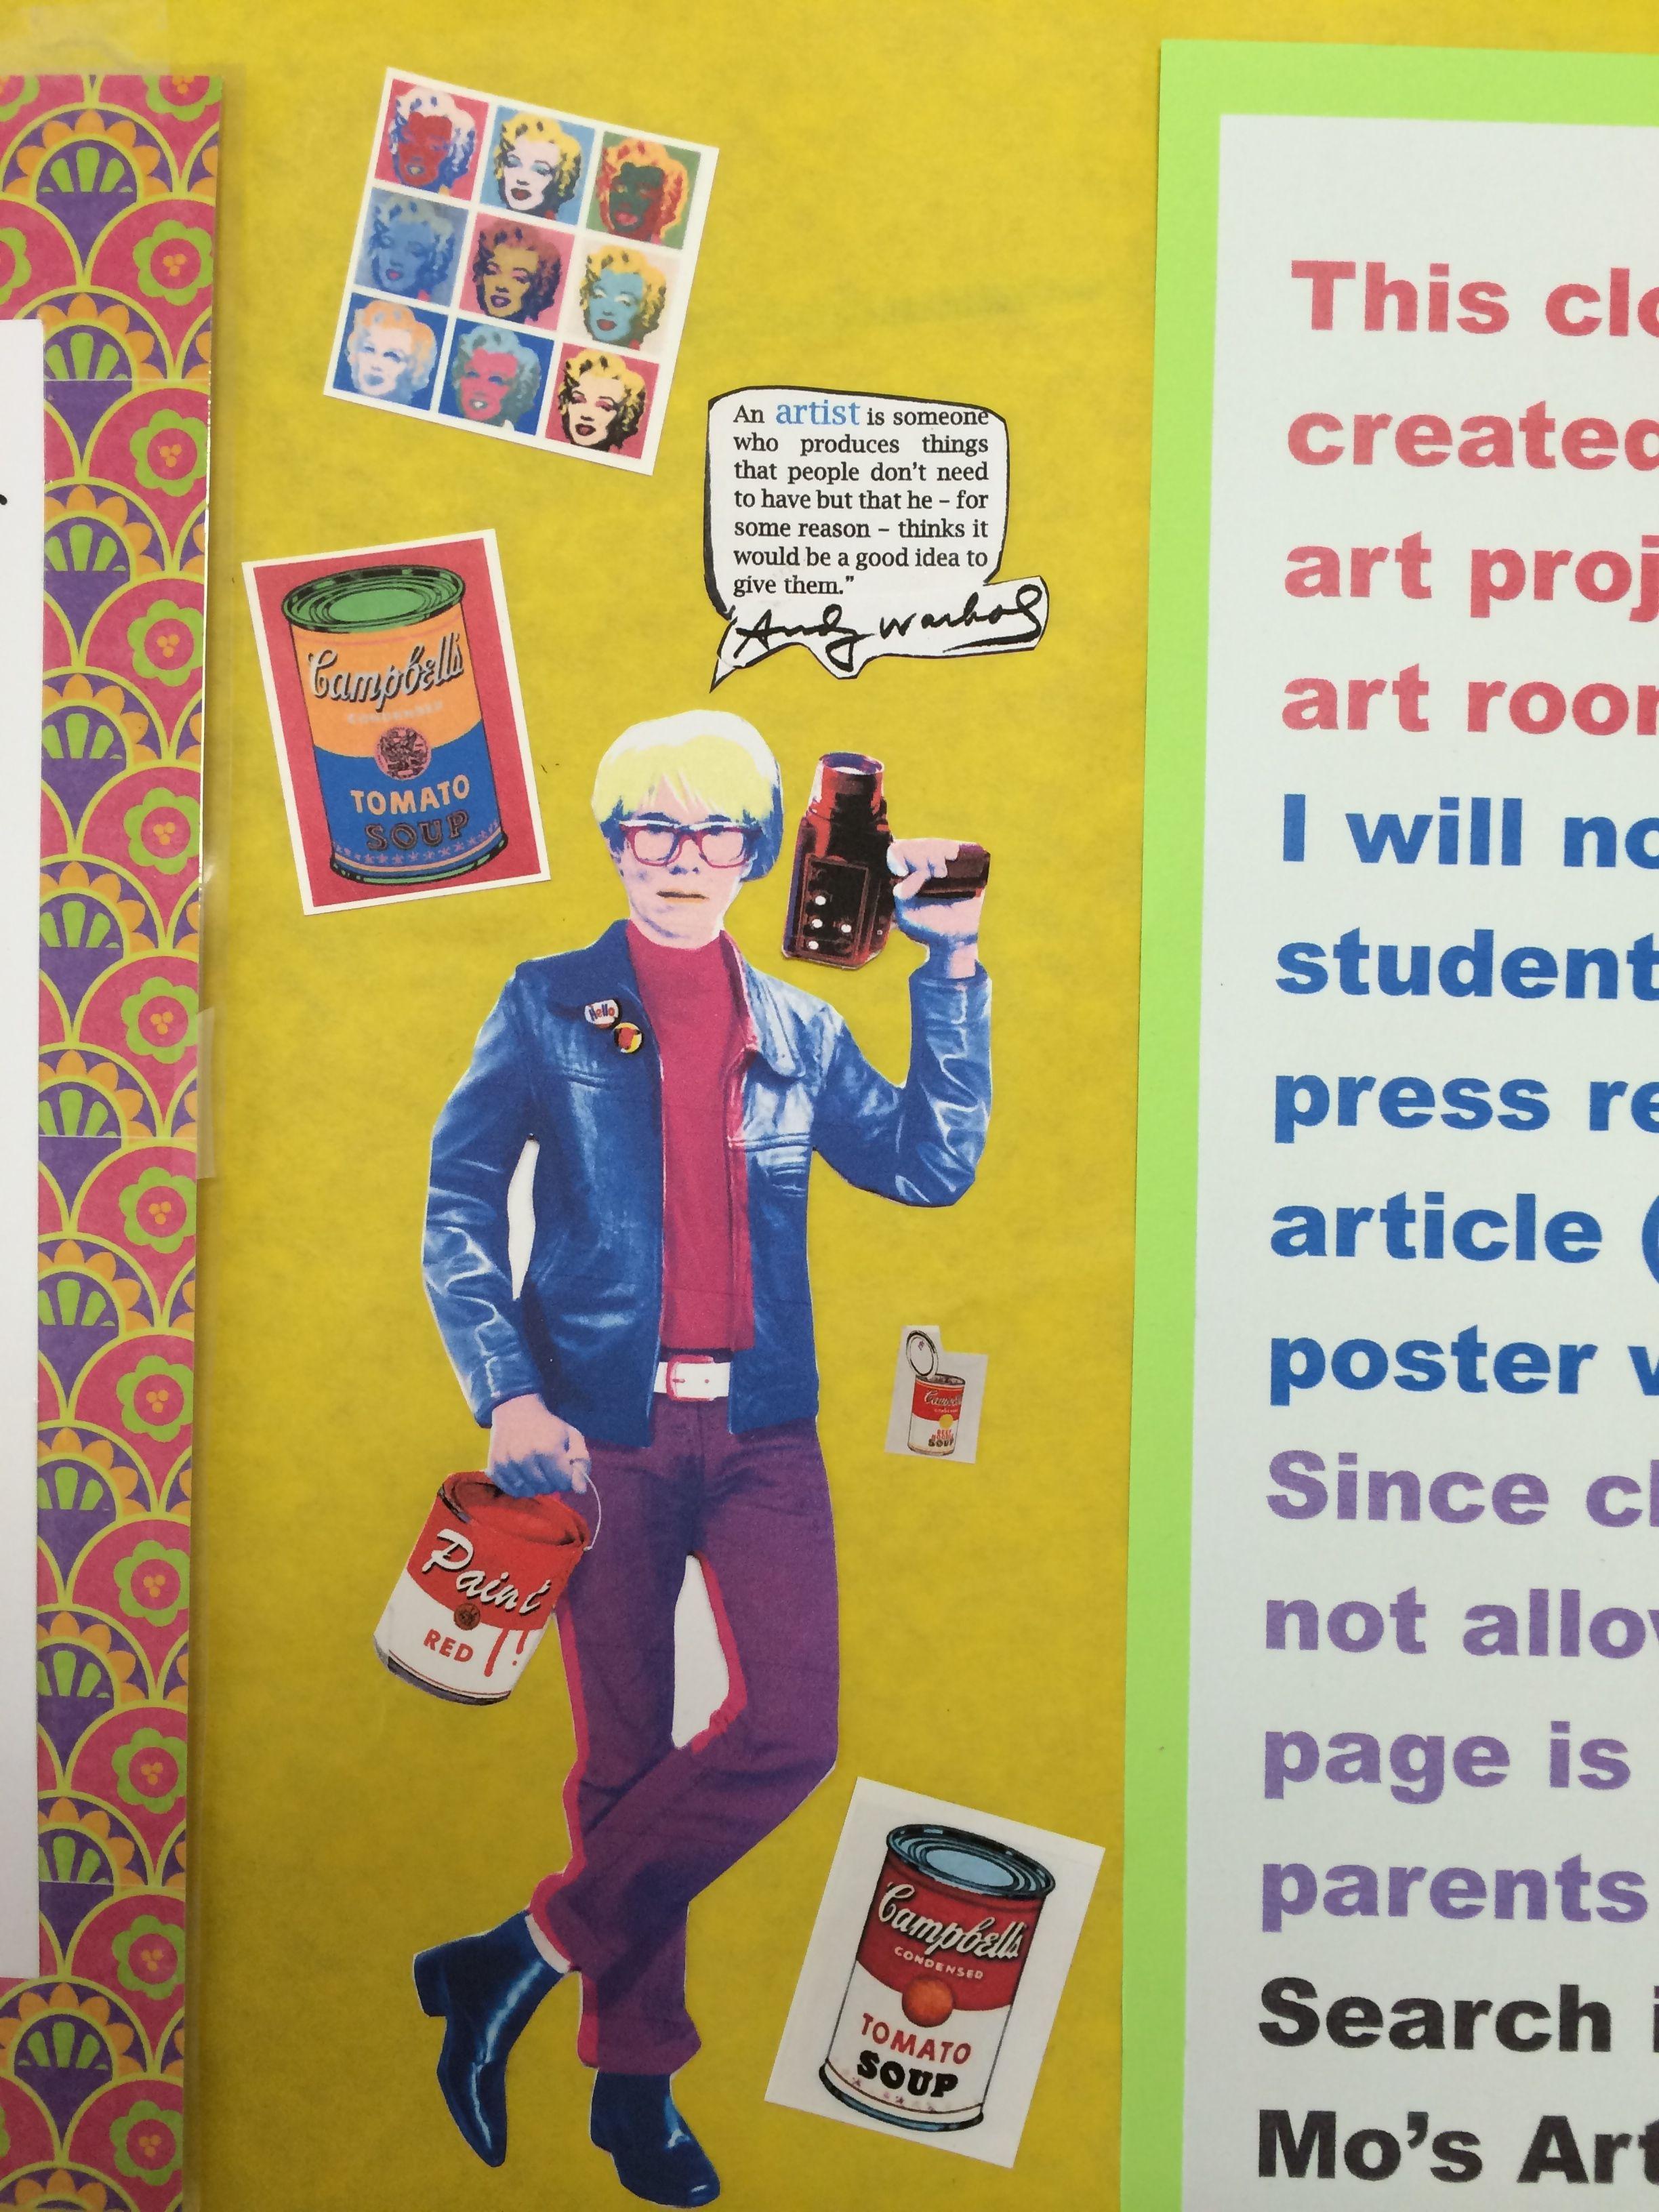 My Life: Andy Warhol